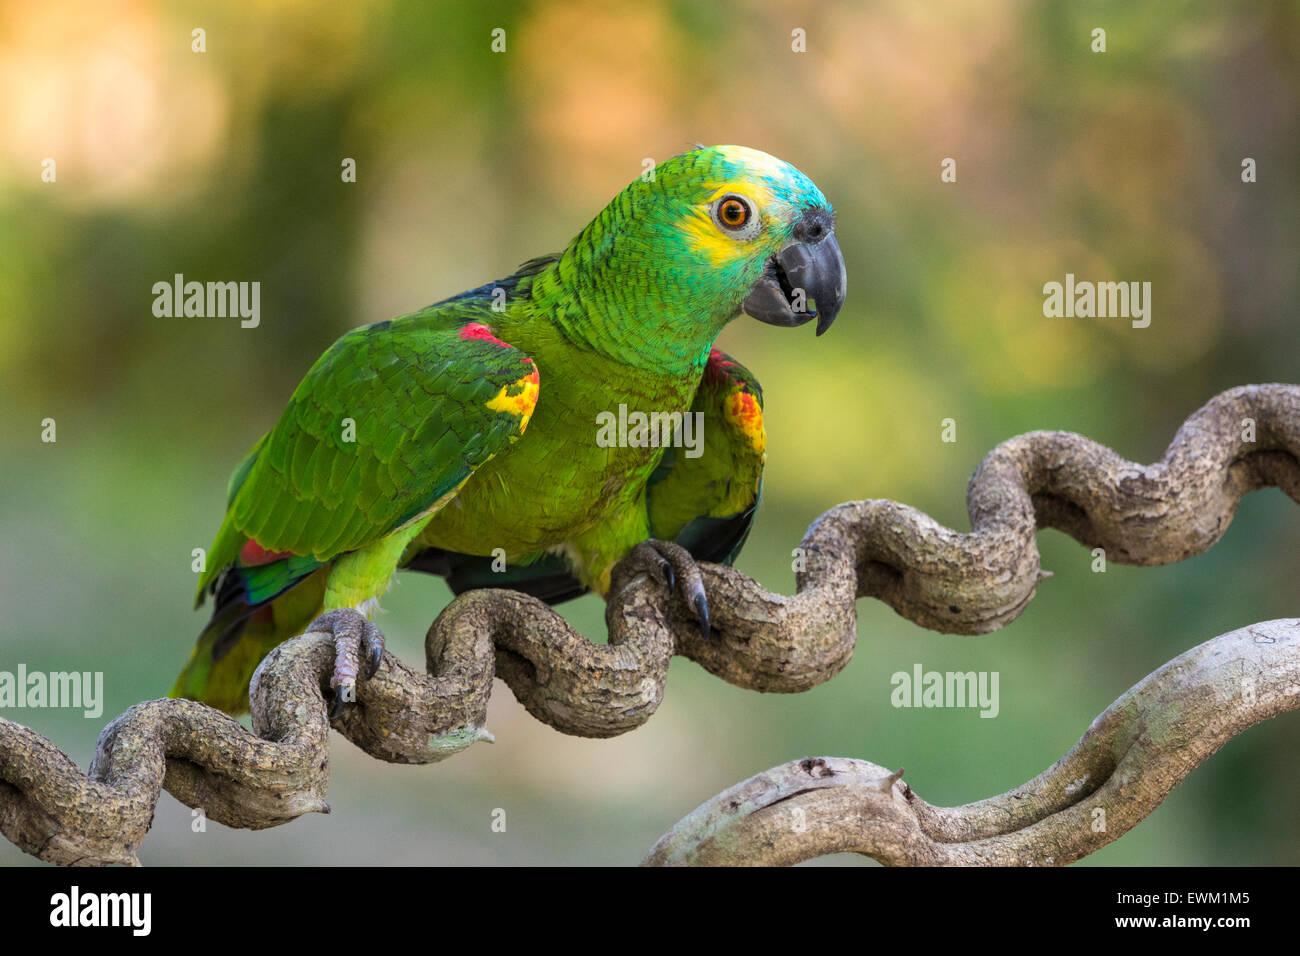 Blau-fronted Amazon Parrot, Amazona Aestiva, manchmal genannt blauem-fronted Parrot, Pantanal, Mato Grosso, Brasilien Stockfoto